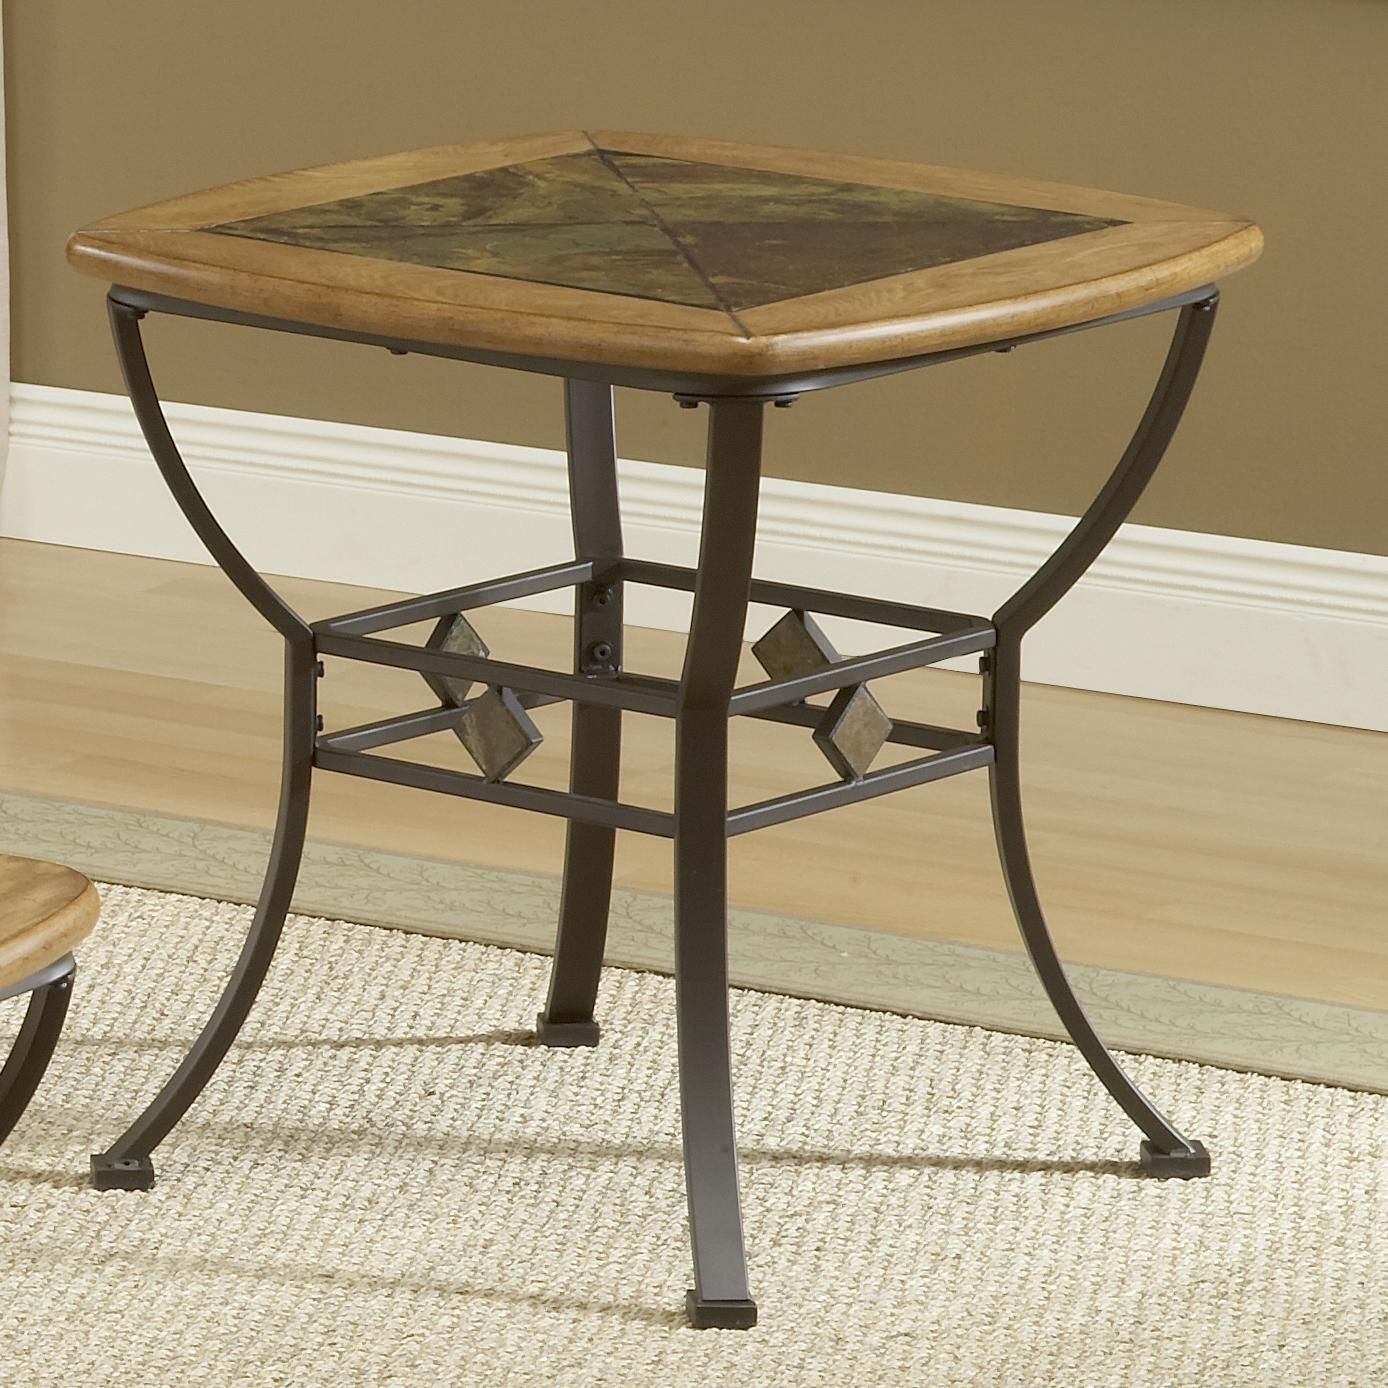 Slate Metal End Tables For Living Room Modern Home